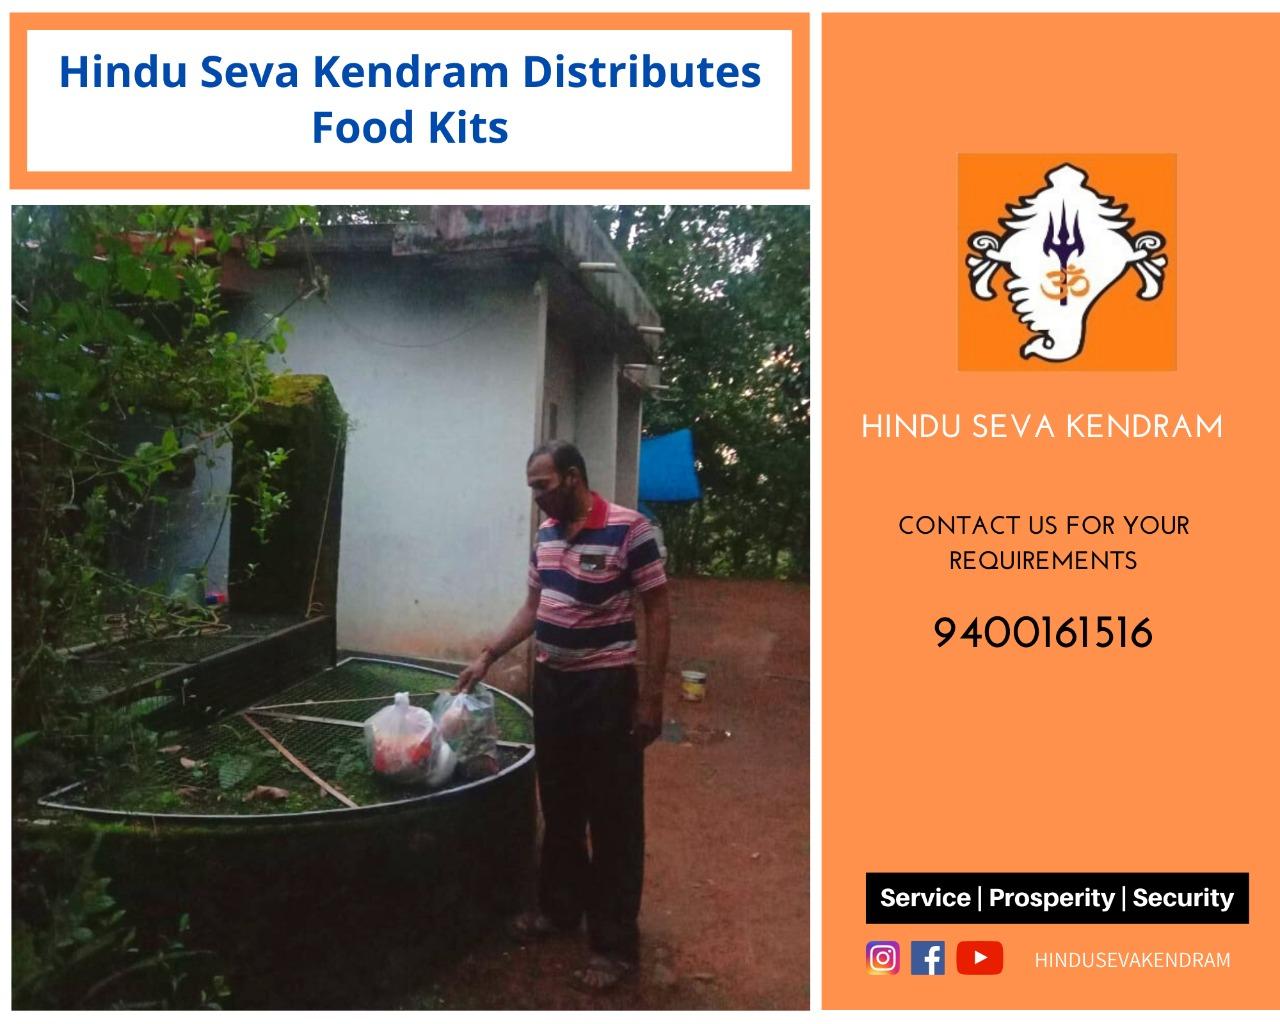 Hindu Seva Kendram Distributes Food kits.